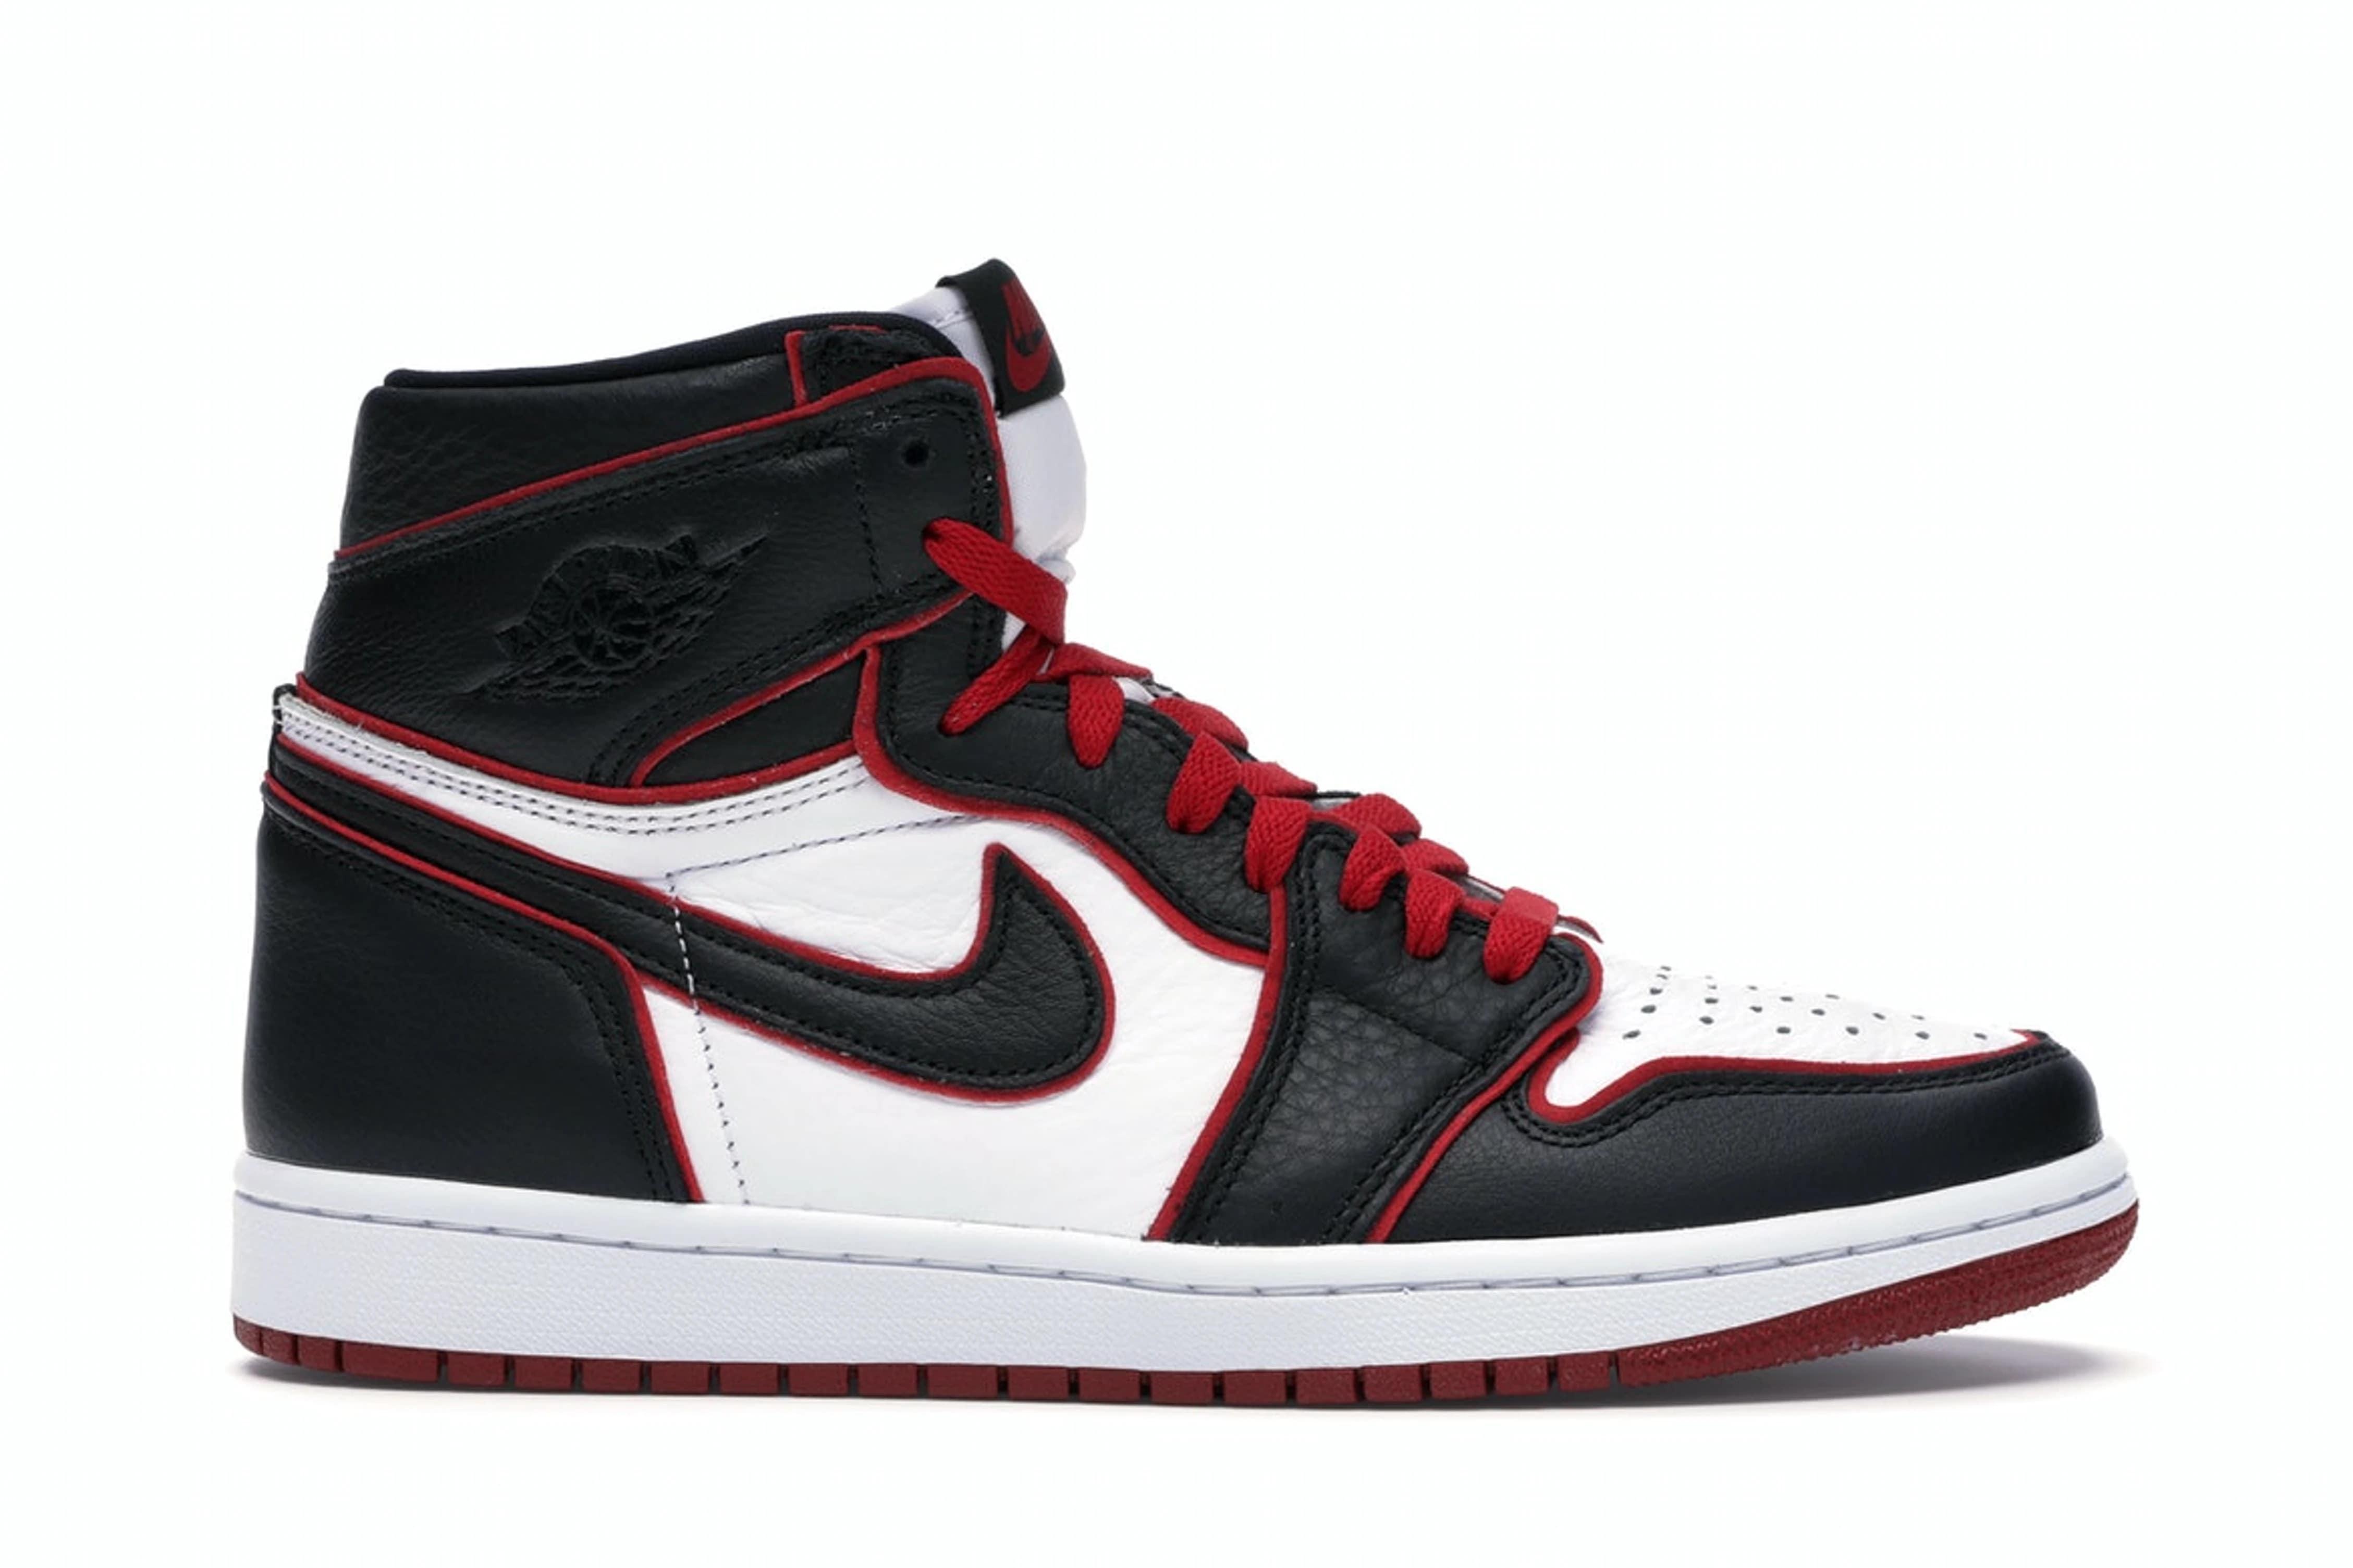 slide 1 - Jordan 1 Retro High Bloodline